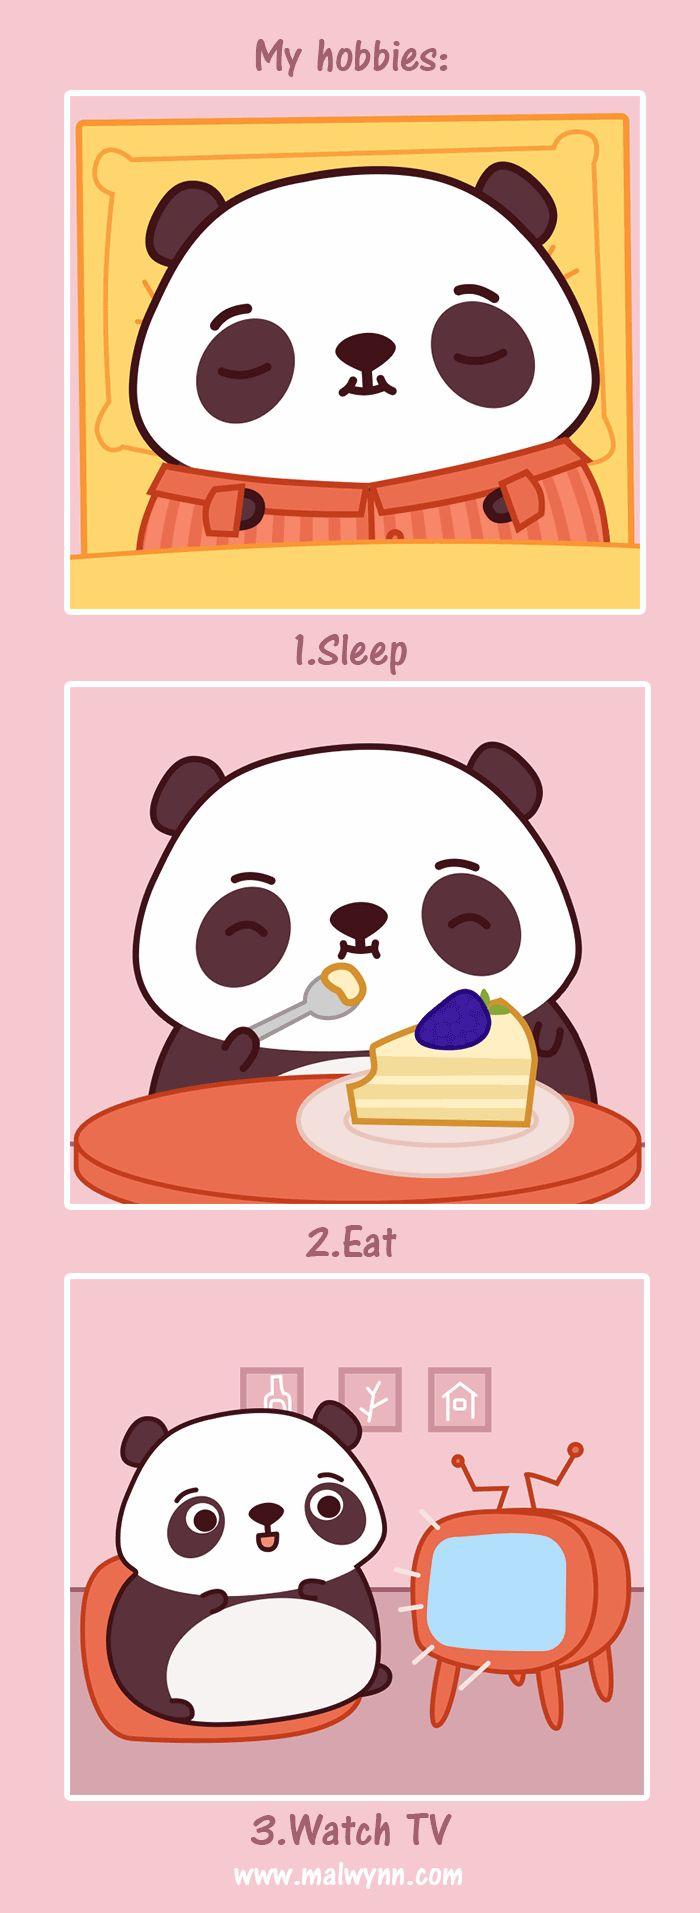 Malwynn - Comics of the Panda Life